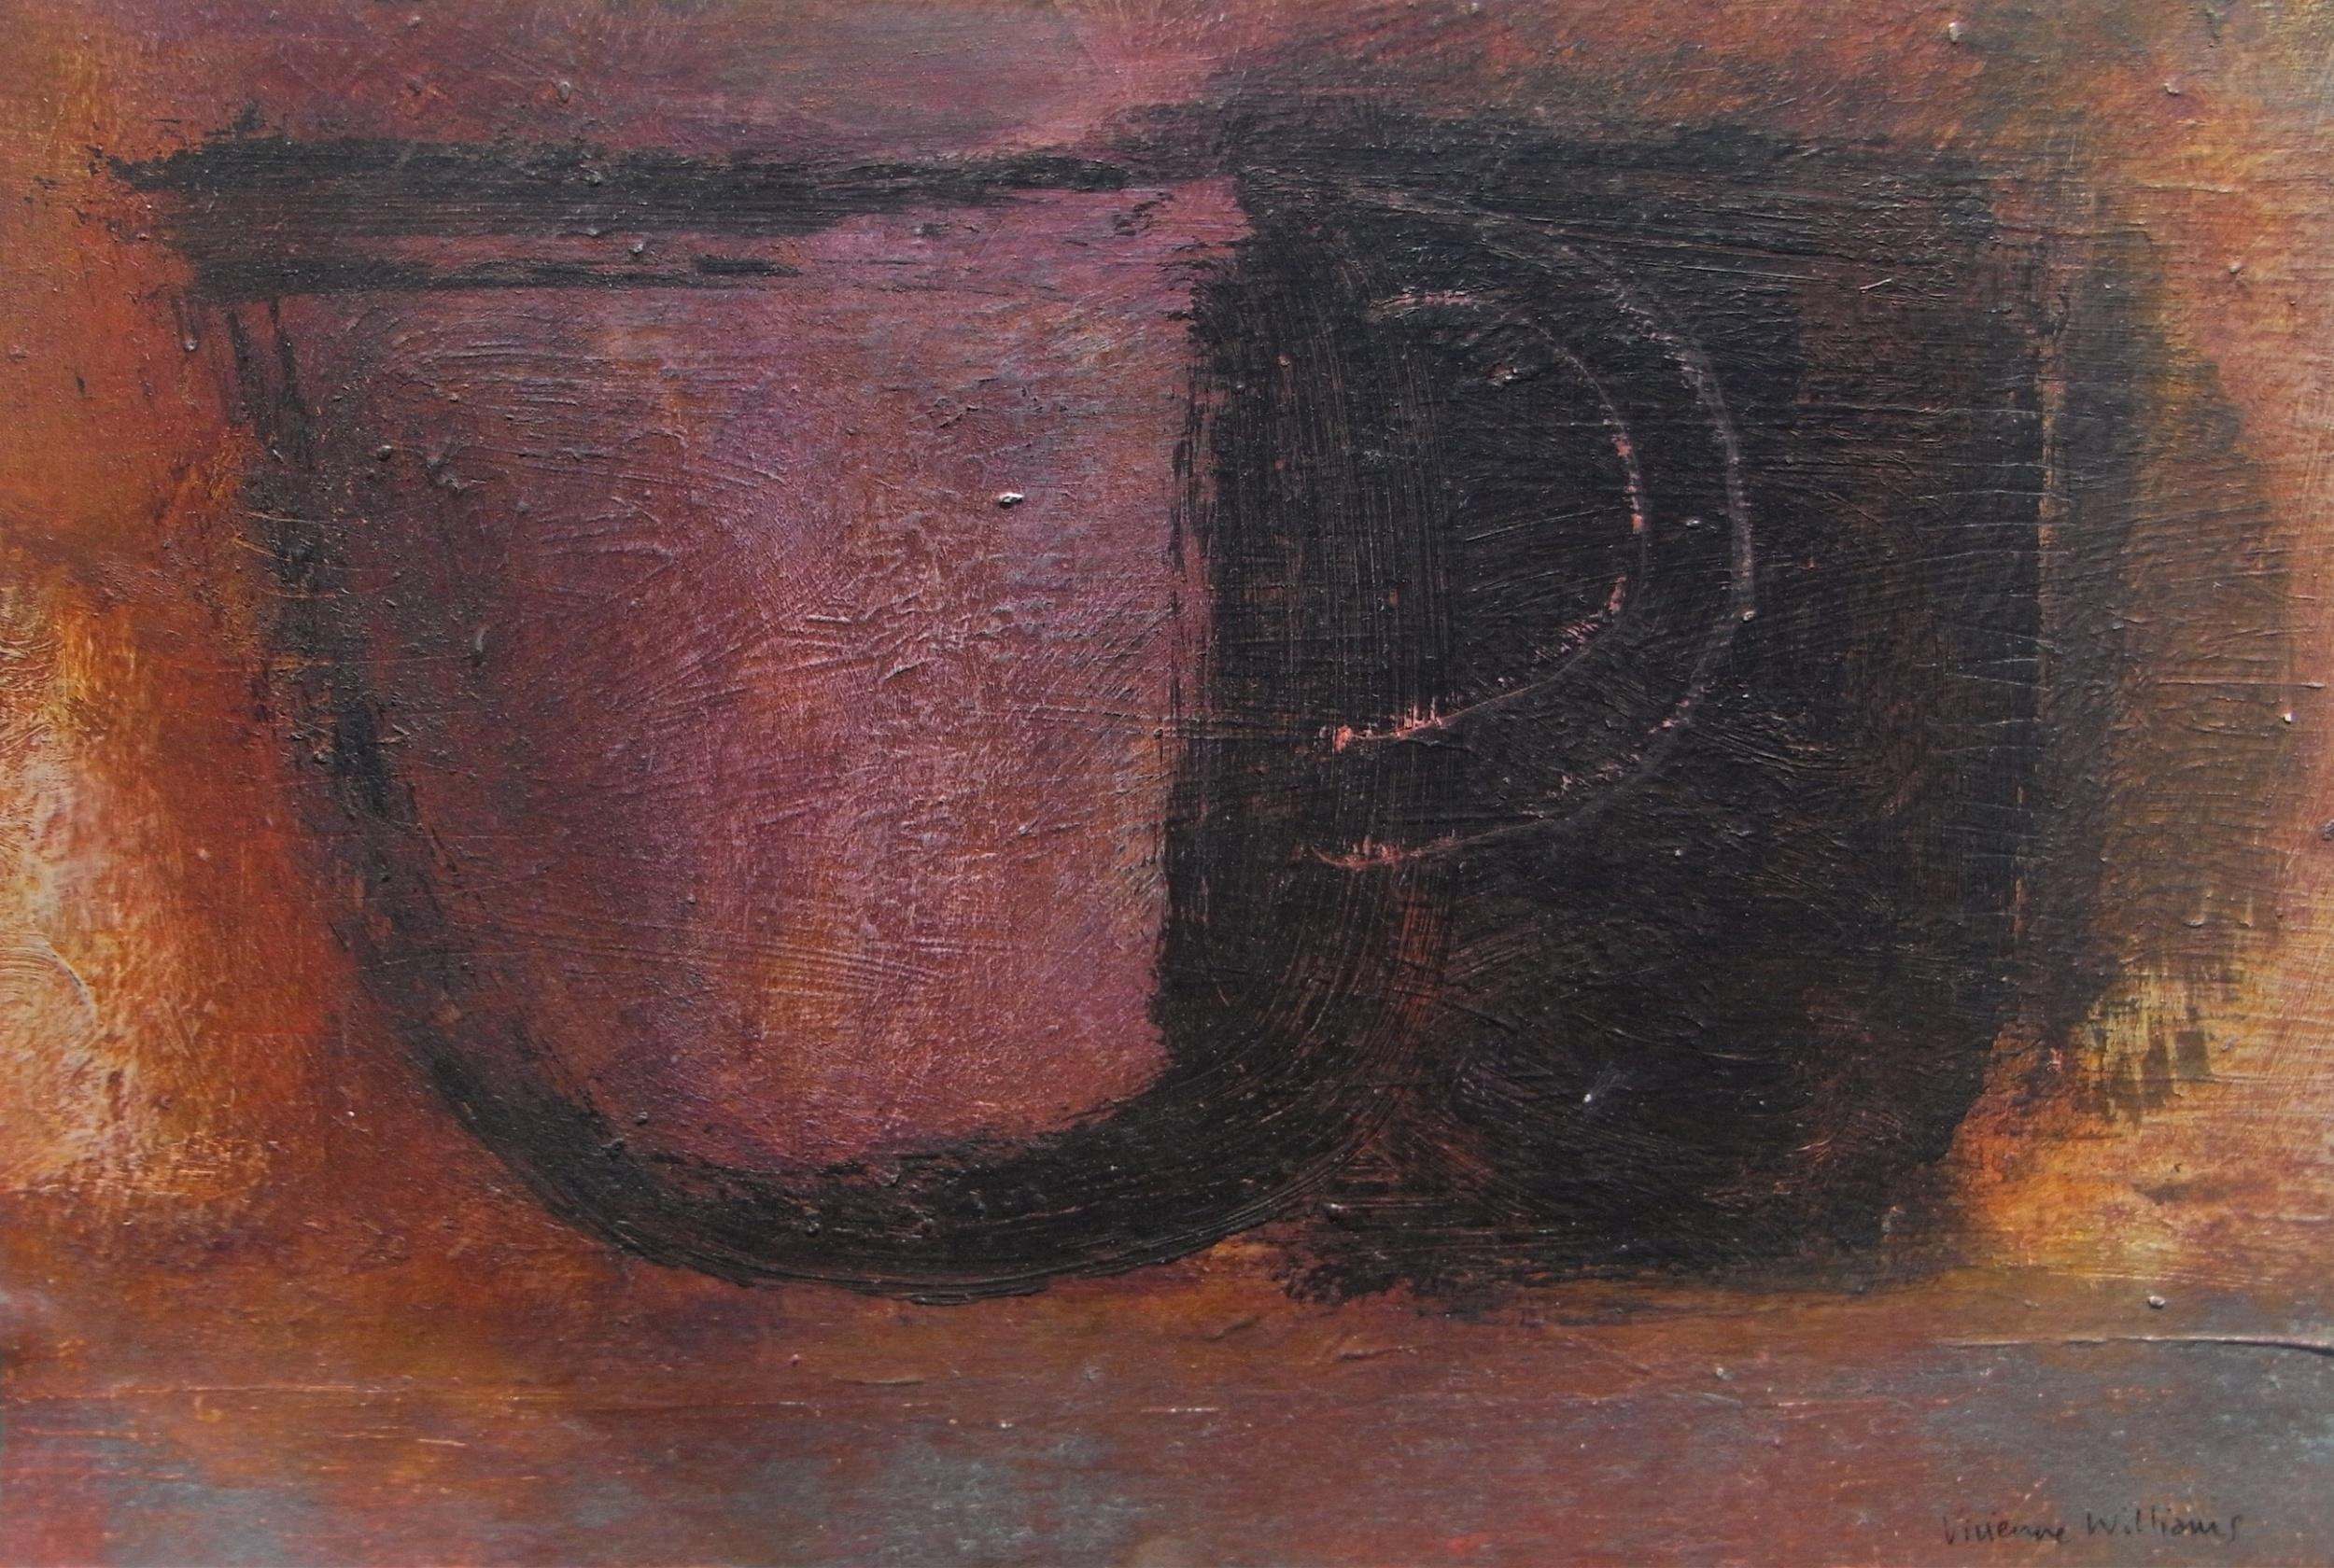 Cup, 17cm x 25cm, 2009